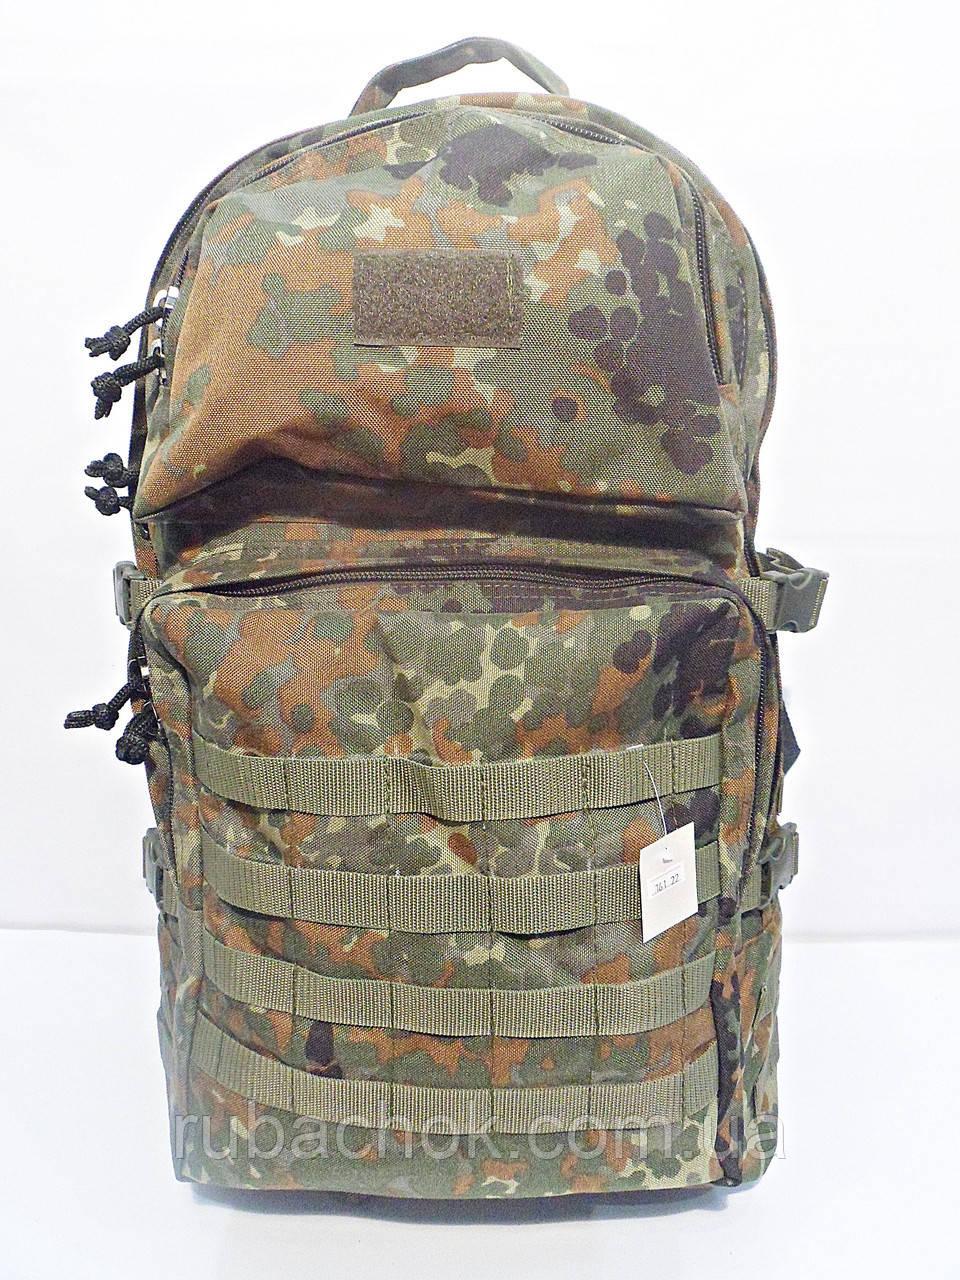 Тактический рюкзак с системой M.O.L.L.E. 161/22 CORDURA 1200 den